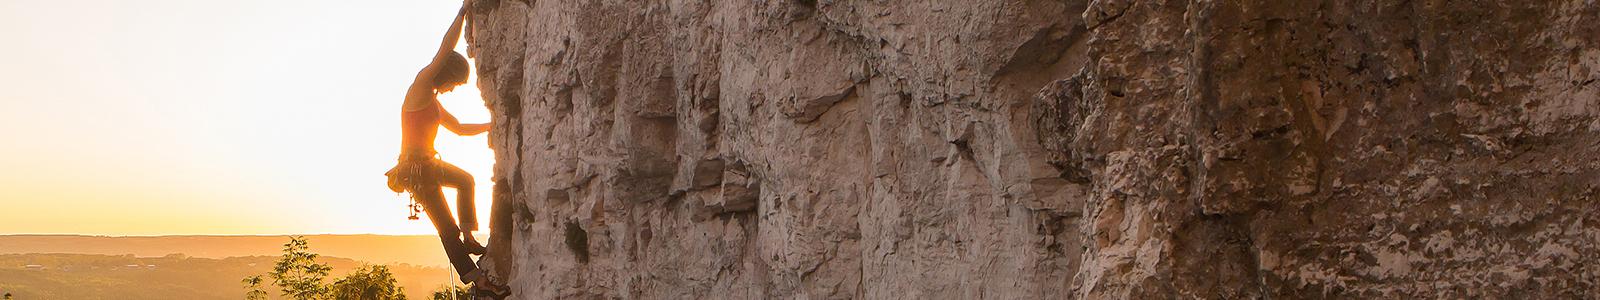 Expert Advice - Climbing